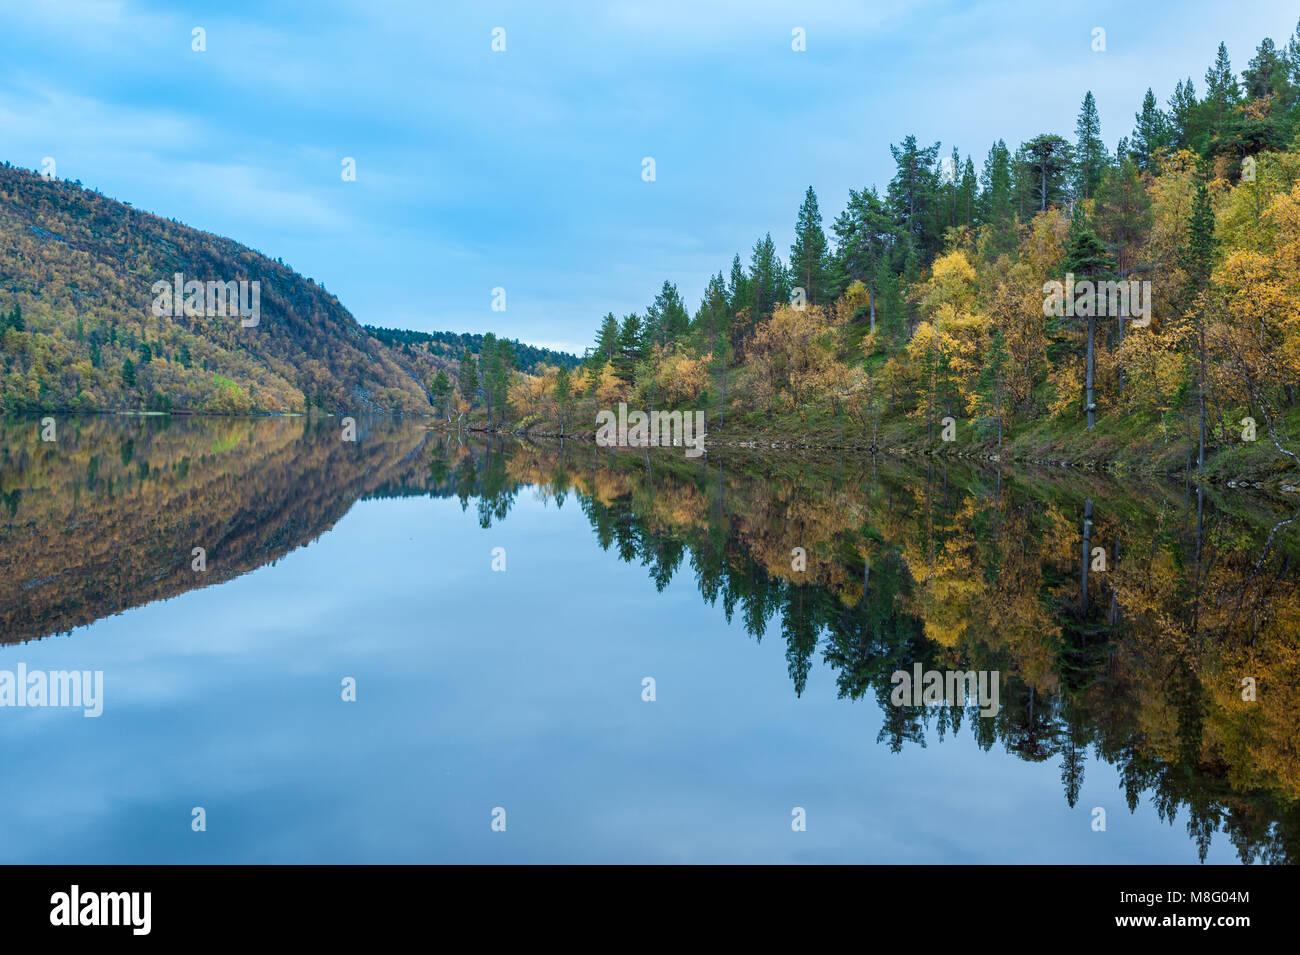 Calma plácido lago de agua dulce con un denso bosque de árboles en la orilla Foto de stock